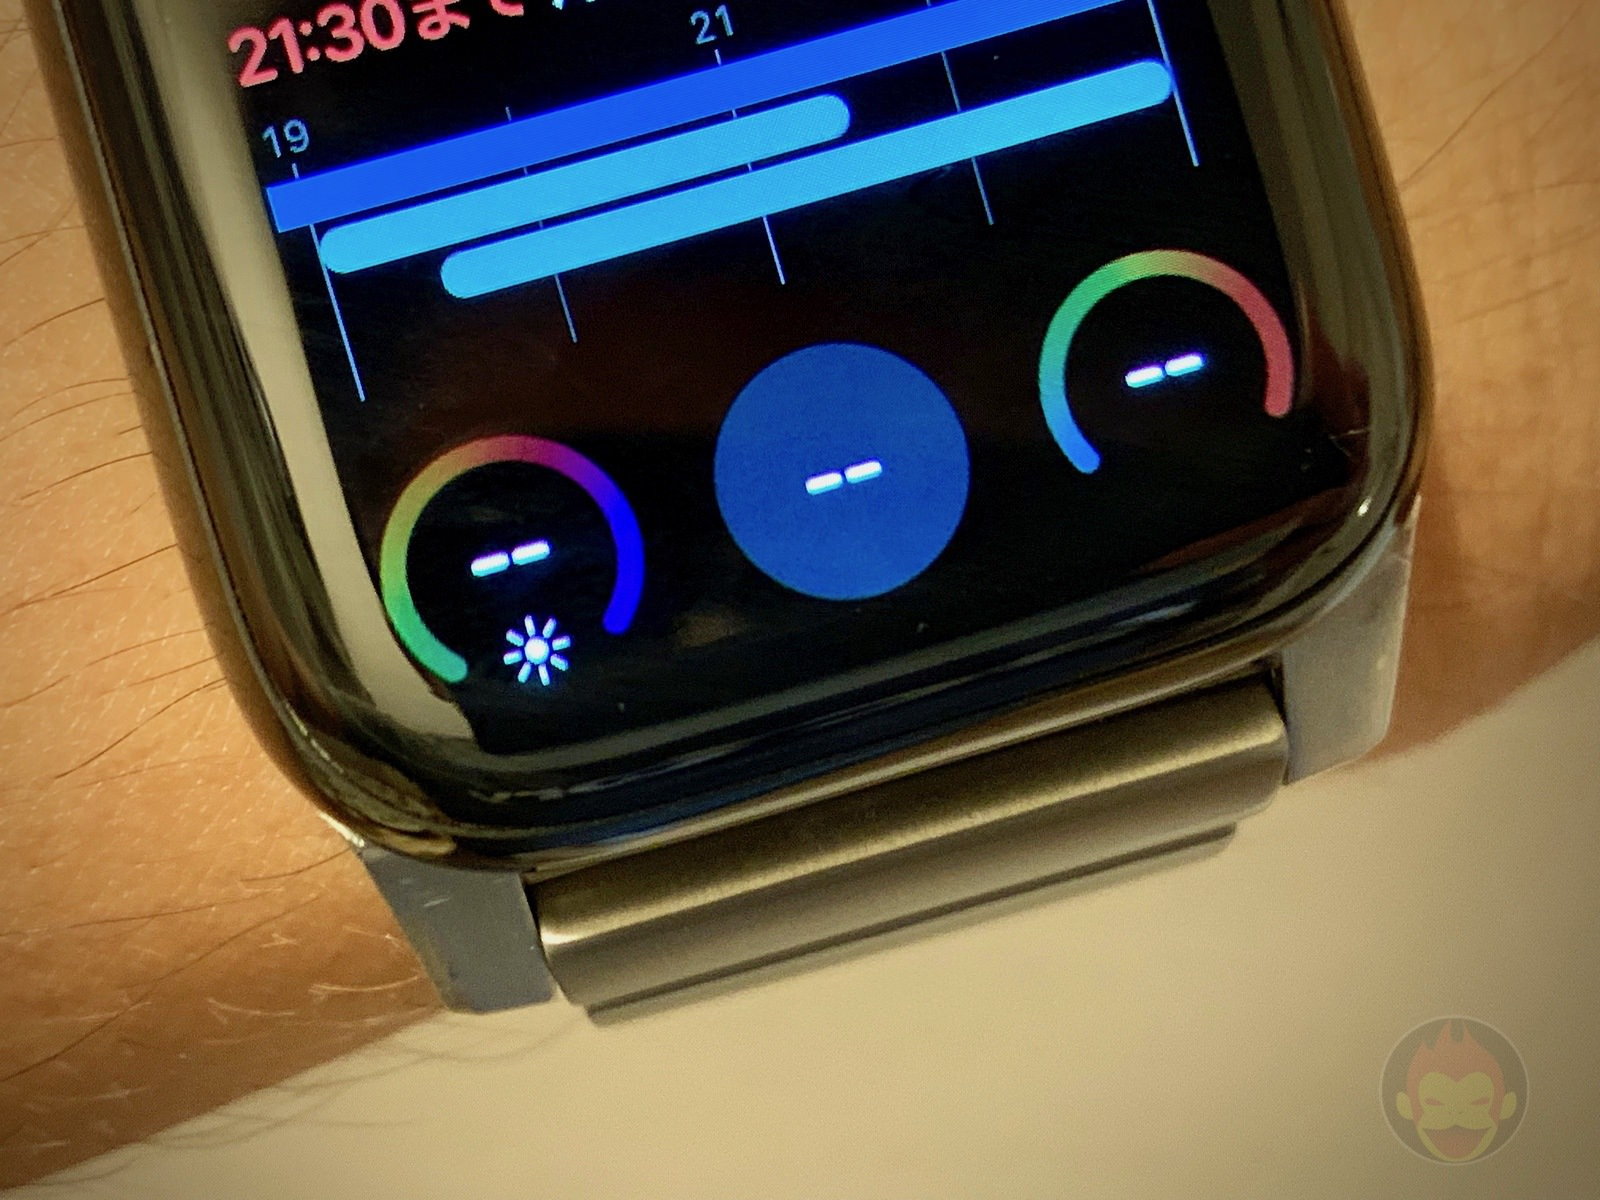 Apple Watch Error 01